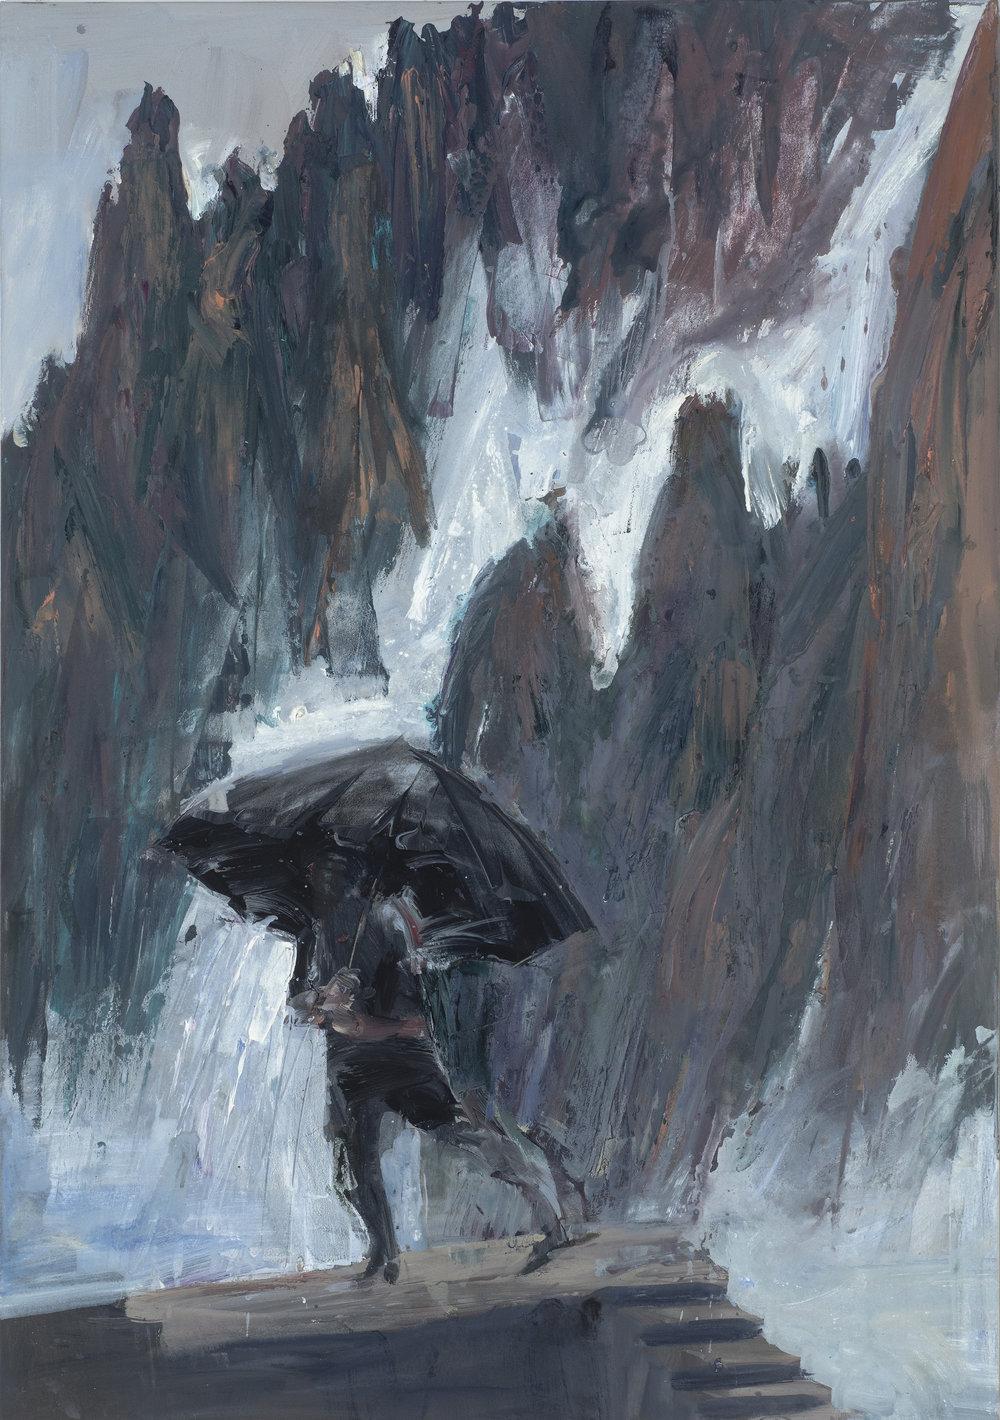 Black umbrella Yellow Mountain  黑傘在黃山中   Euan Macleod , 2016  Acrylic on polyester, 120 x 84 cm, HKD 93,400